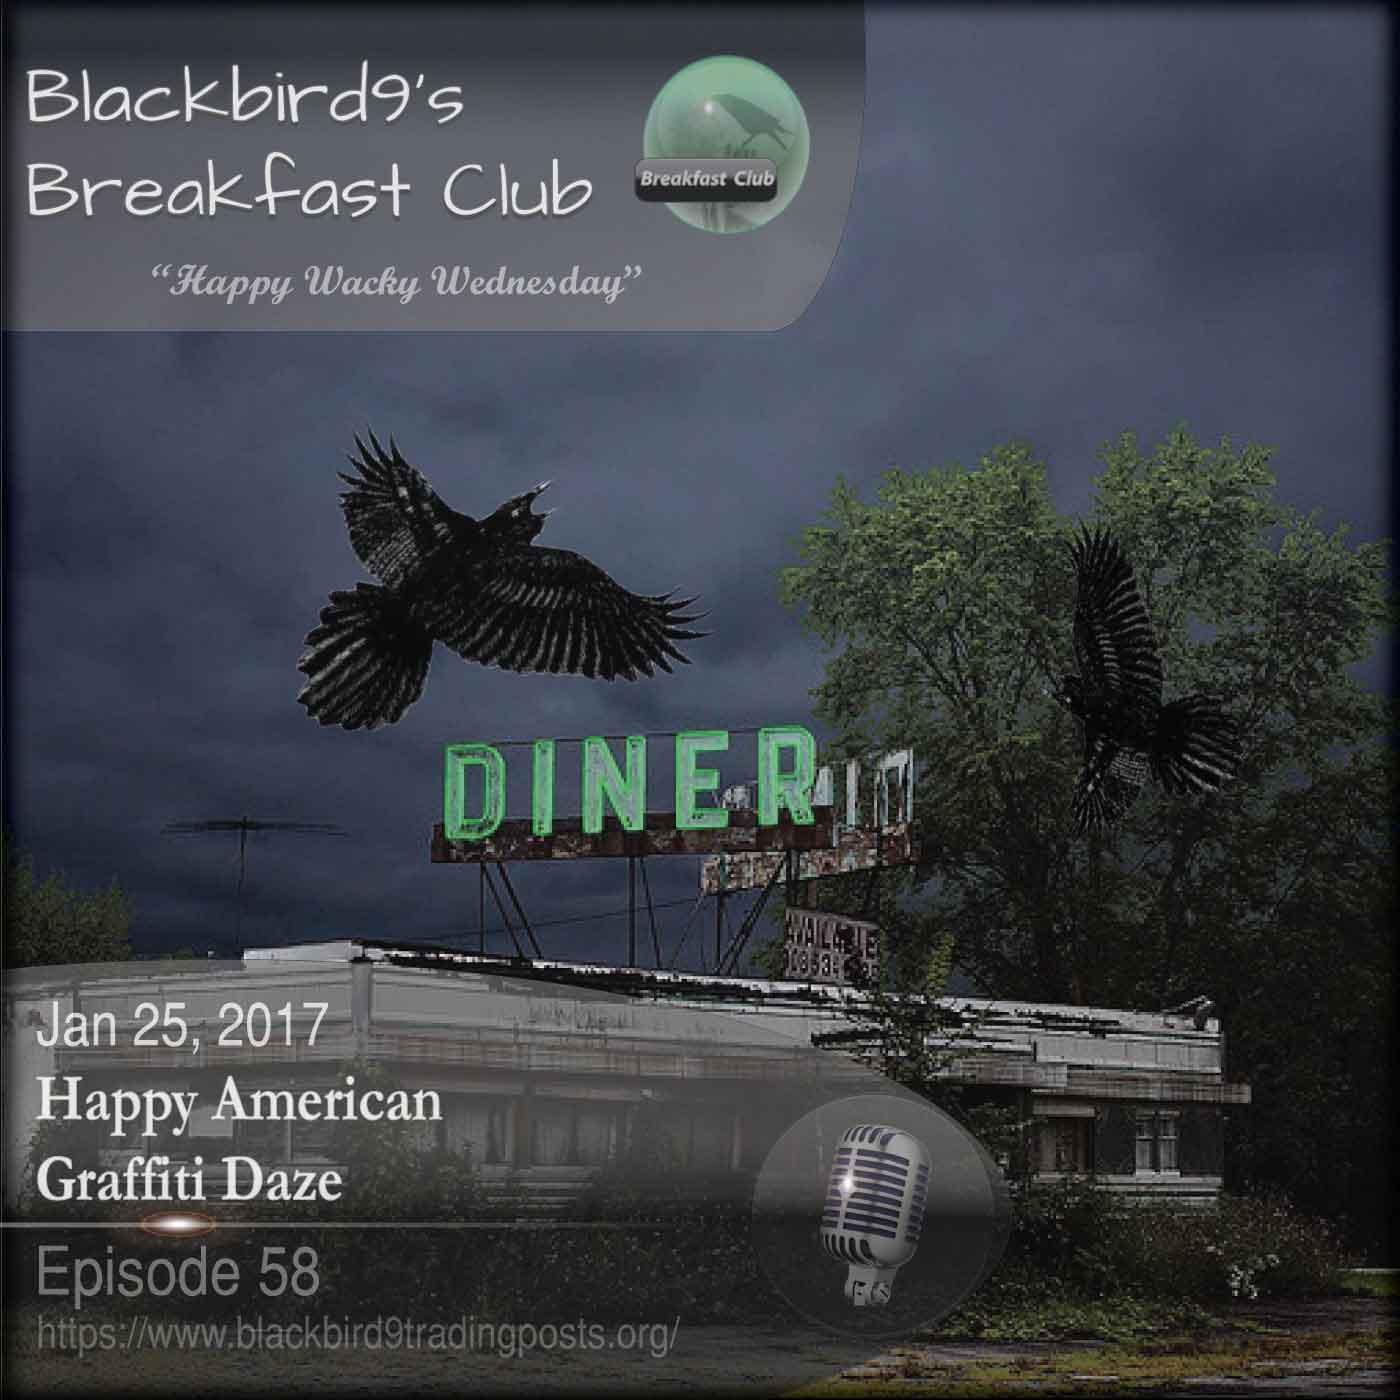 Happy American Graffiti Daze - Blackbird9